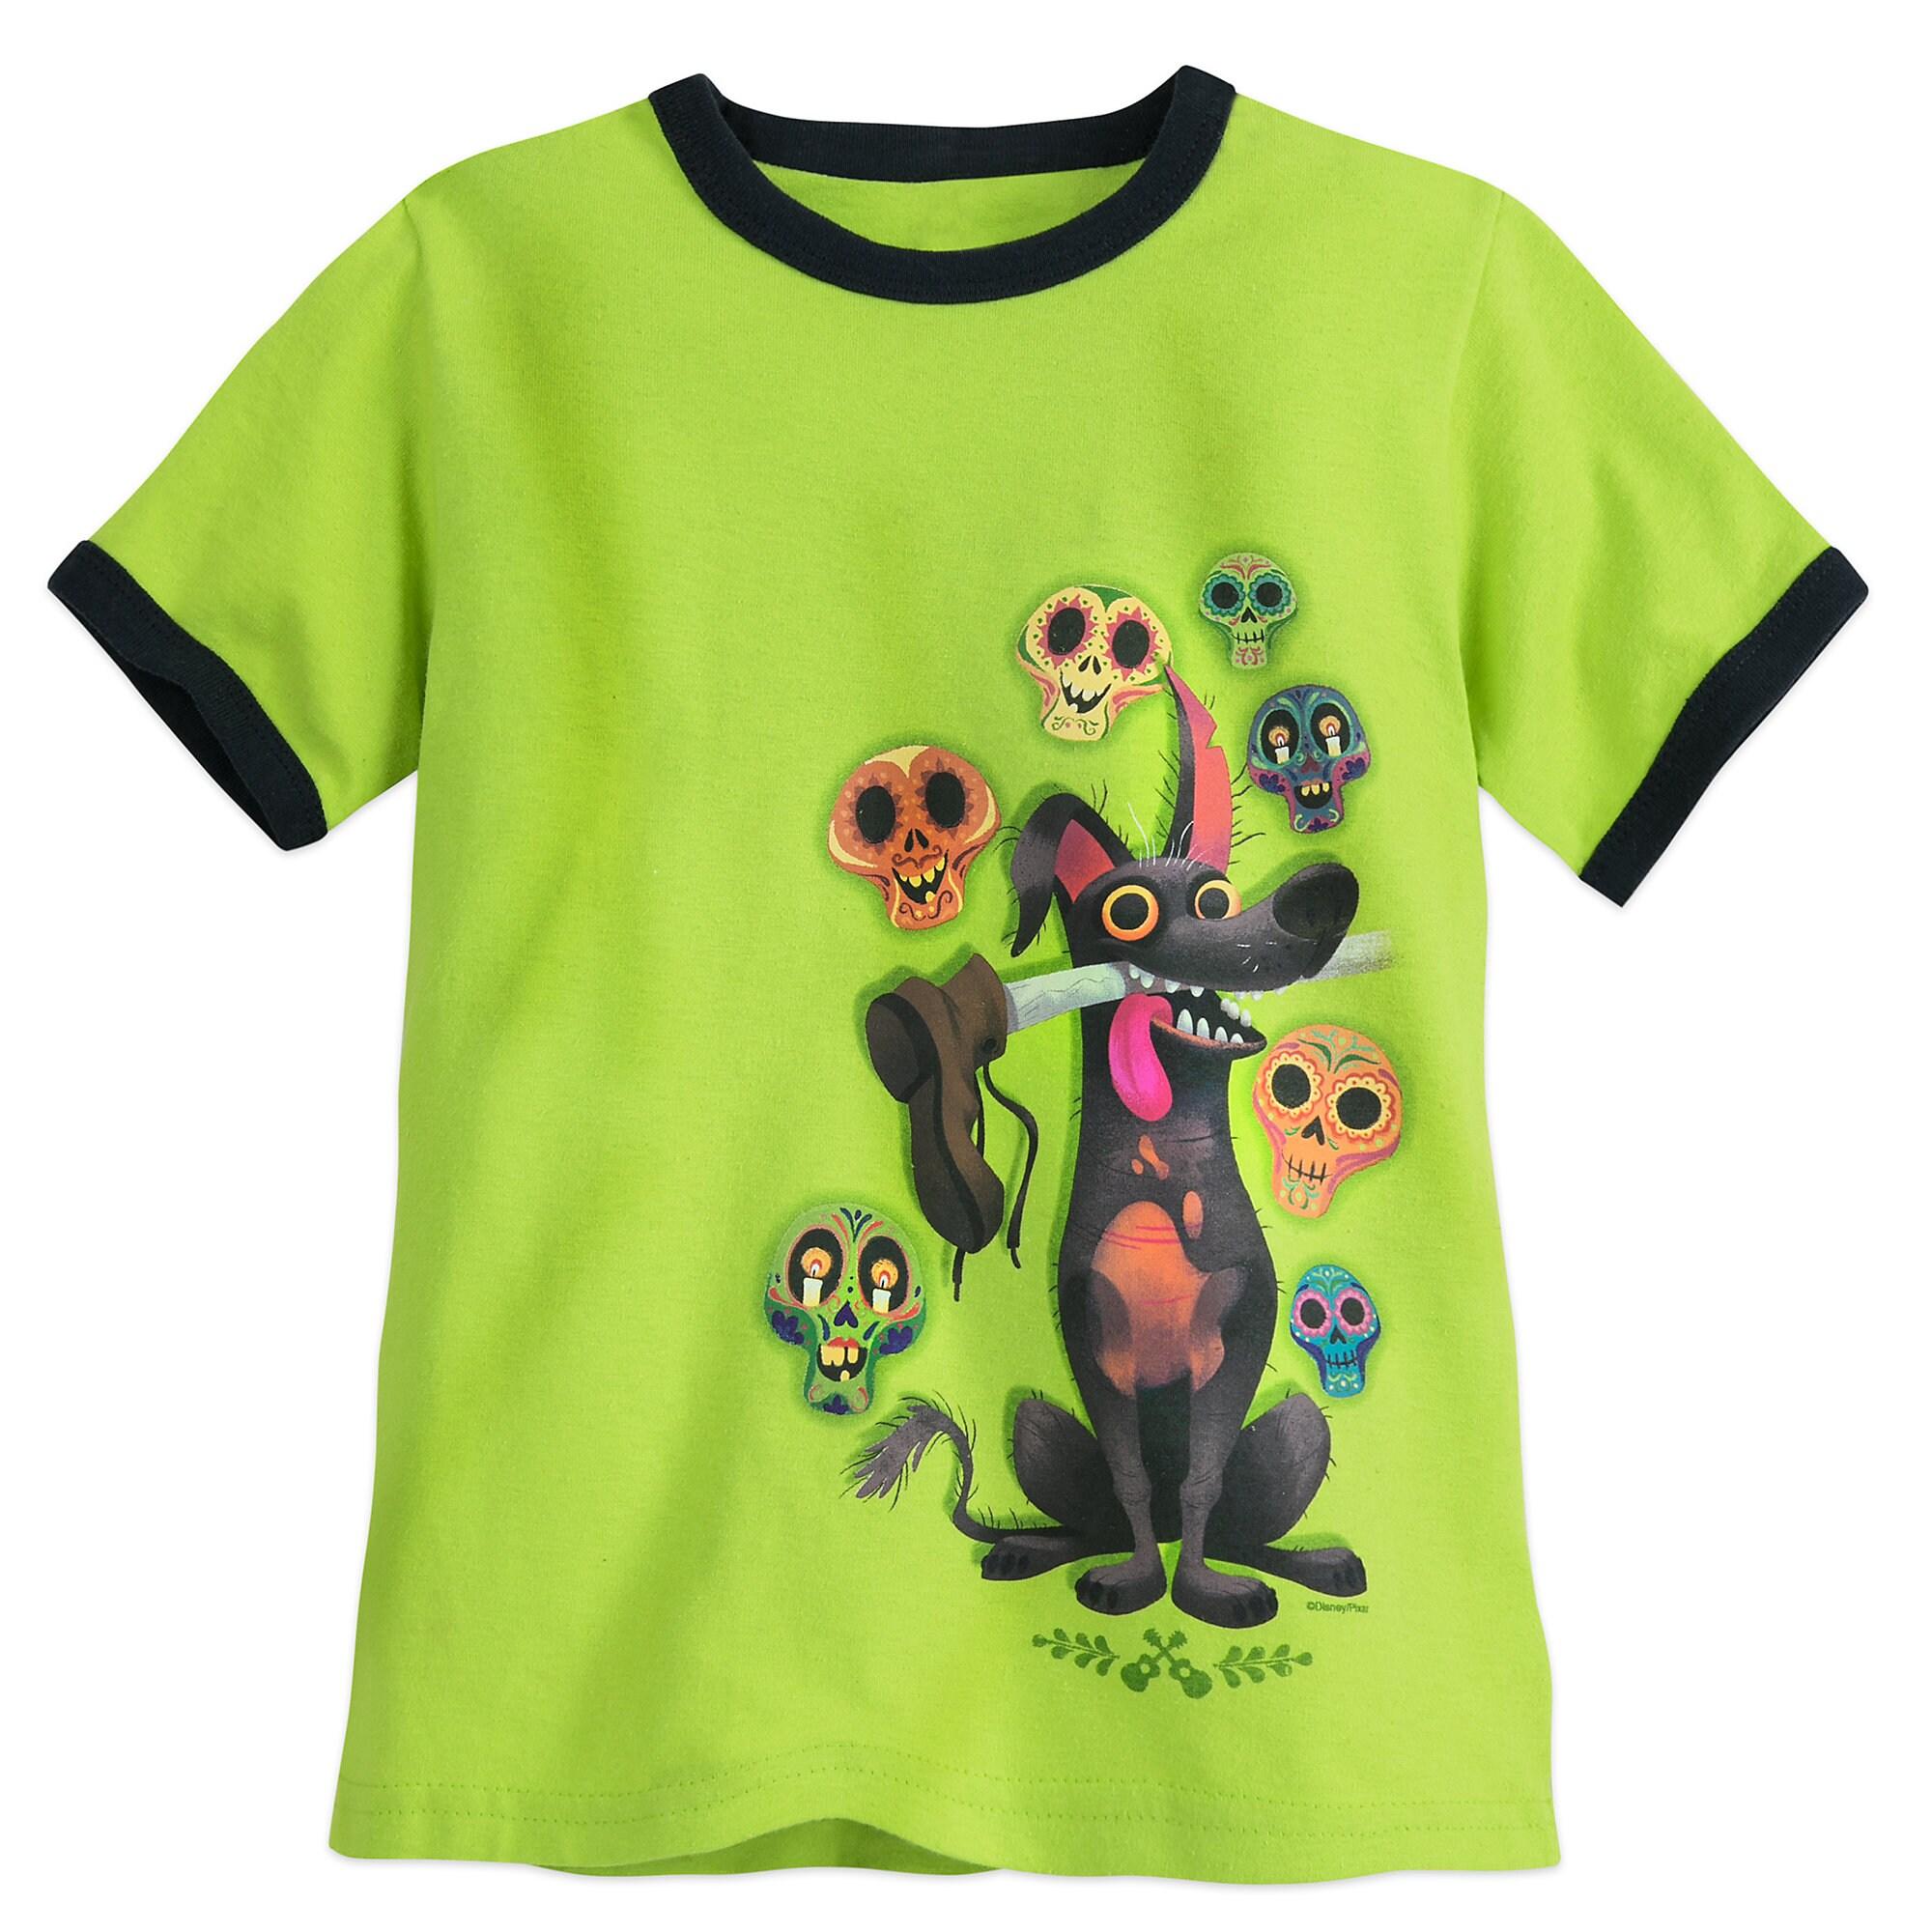 Dante Ringer T-Shirt - Coco - Boys